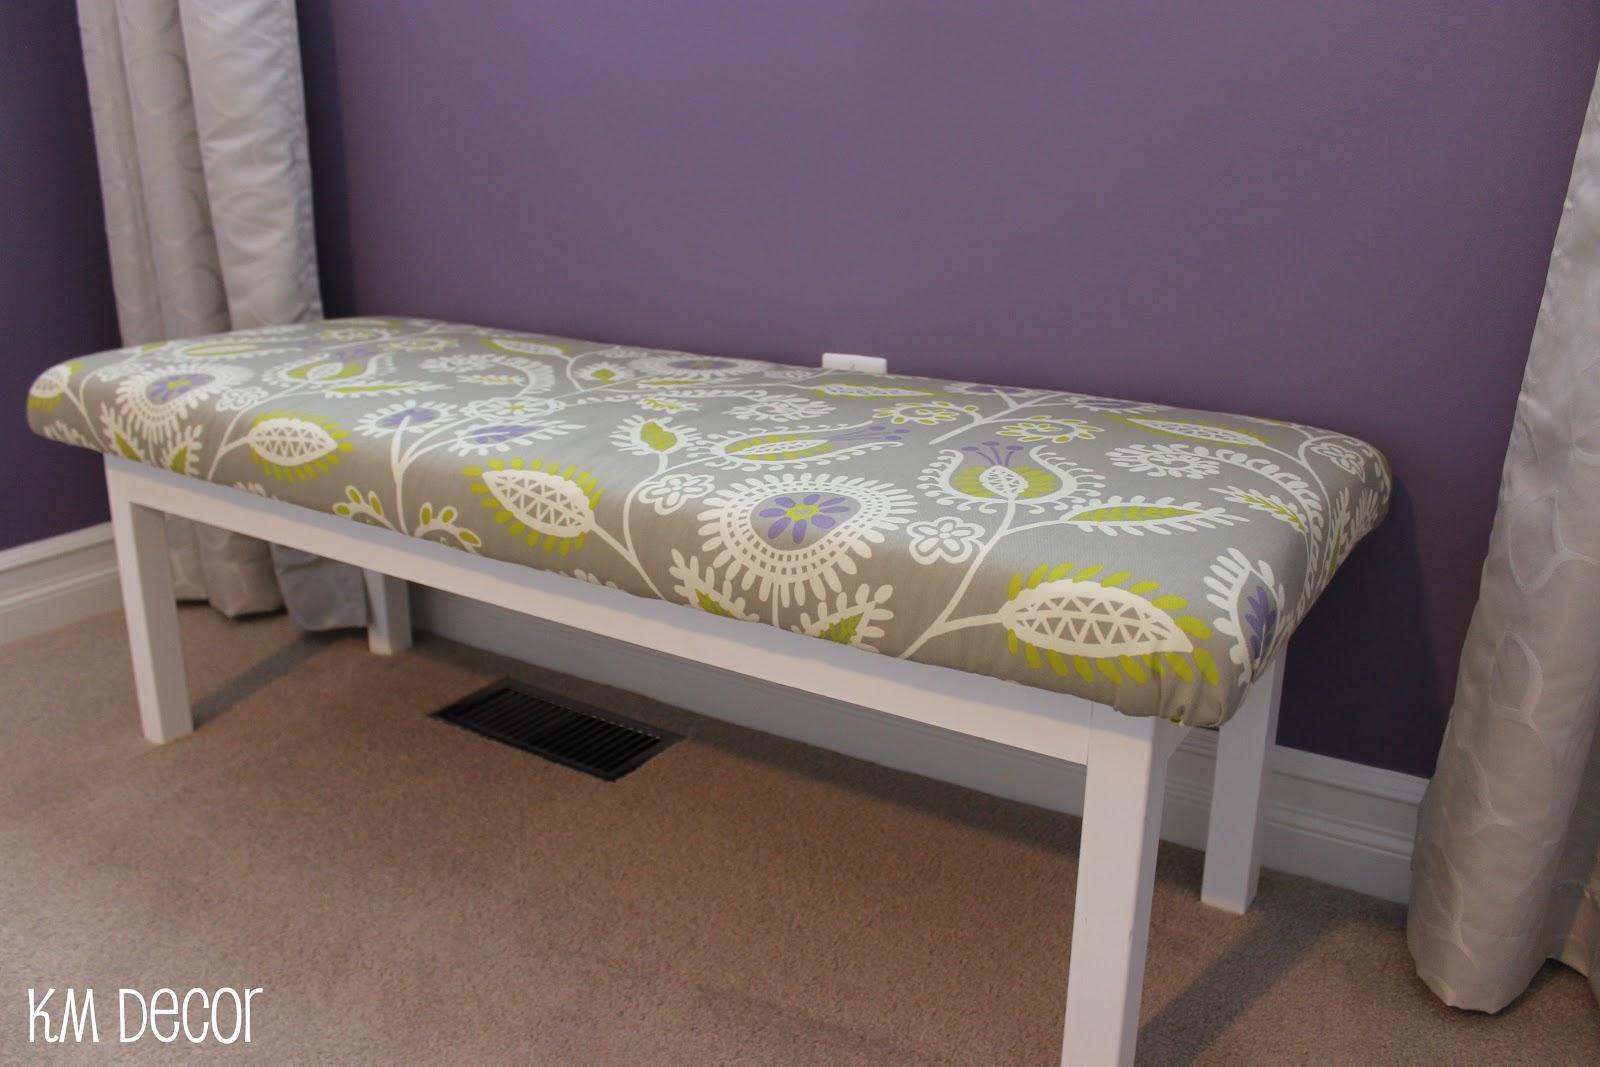 KM Decor: DIY: Upholstered Bench